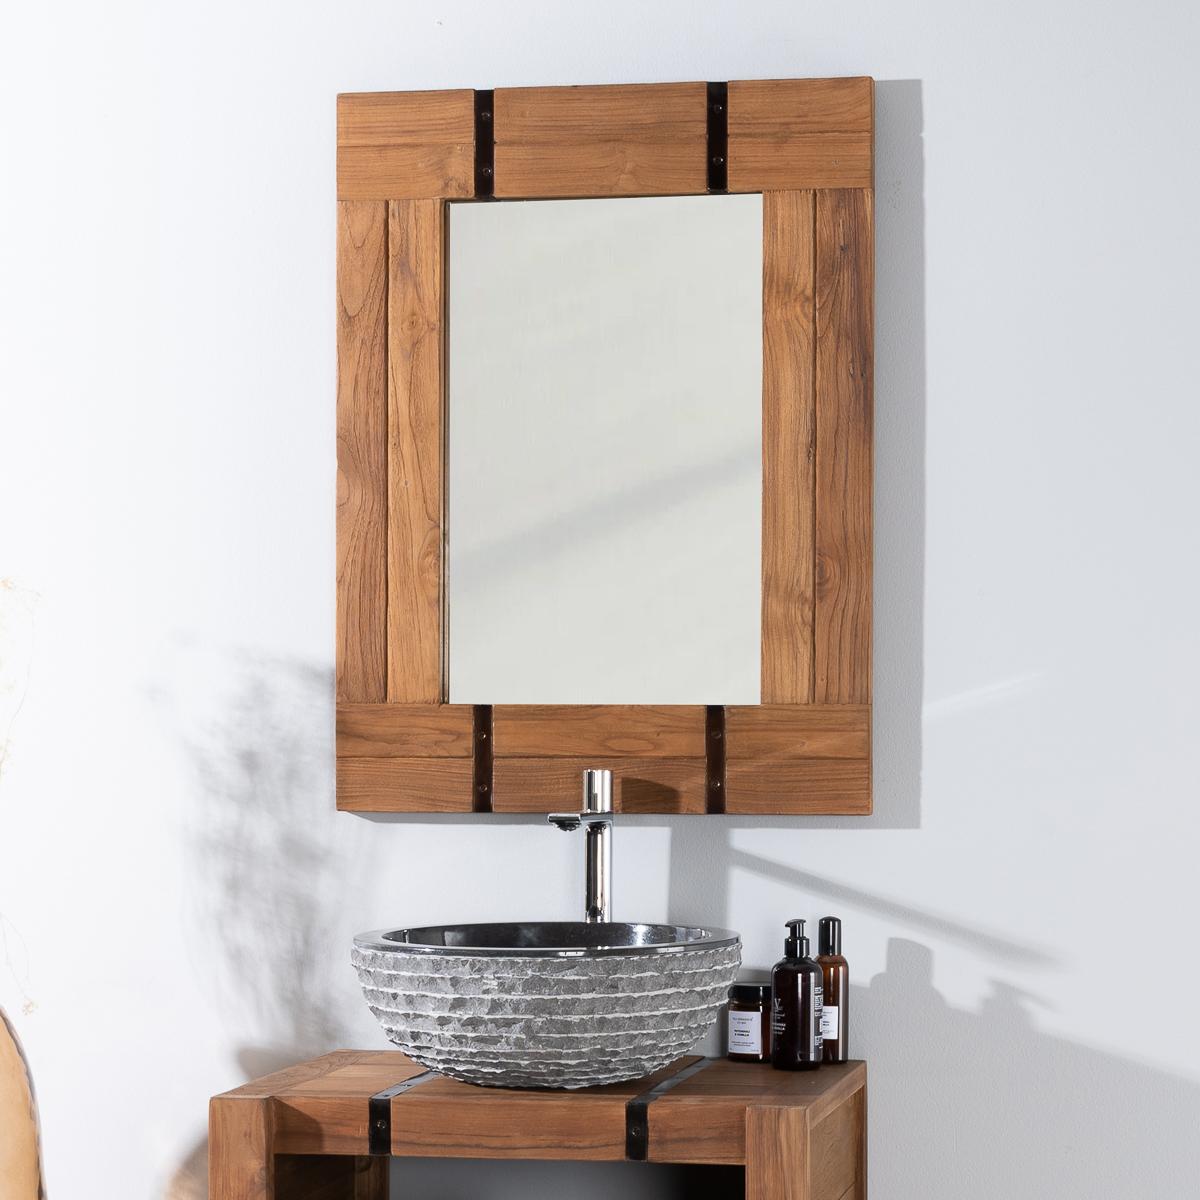 Miroir de salle de bain naturel loft 60x80 naturel for Mirroir salle de bain